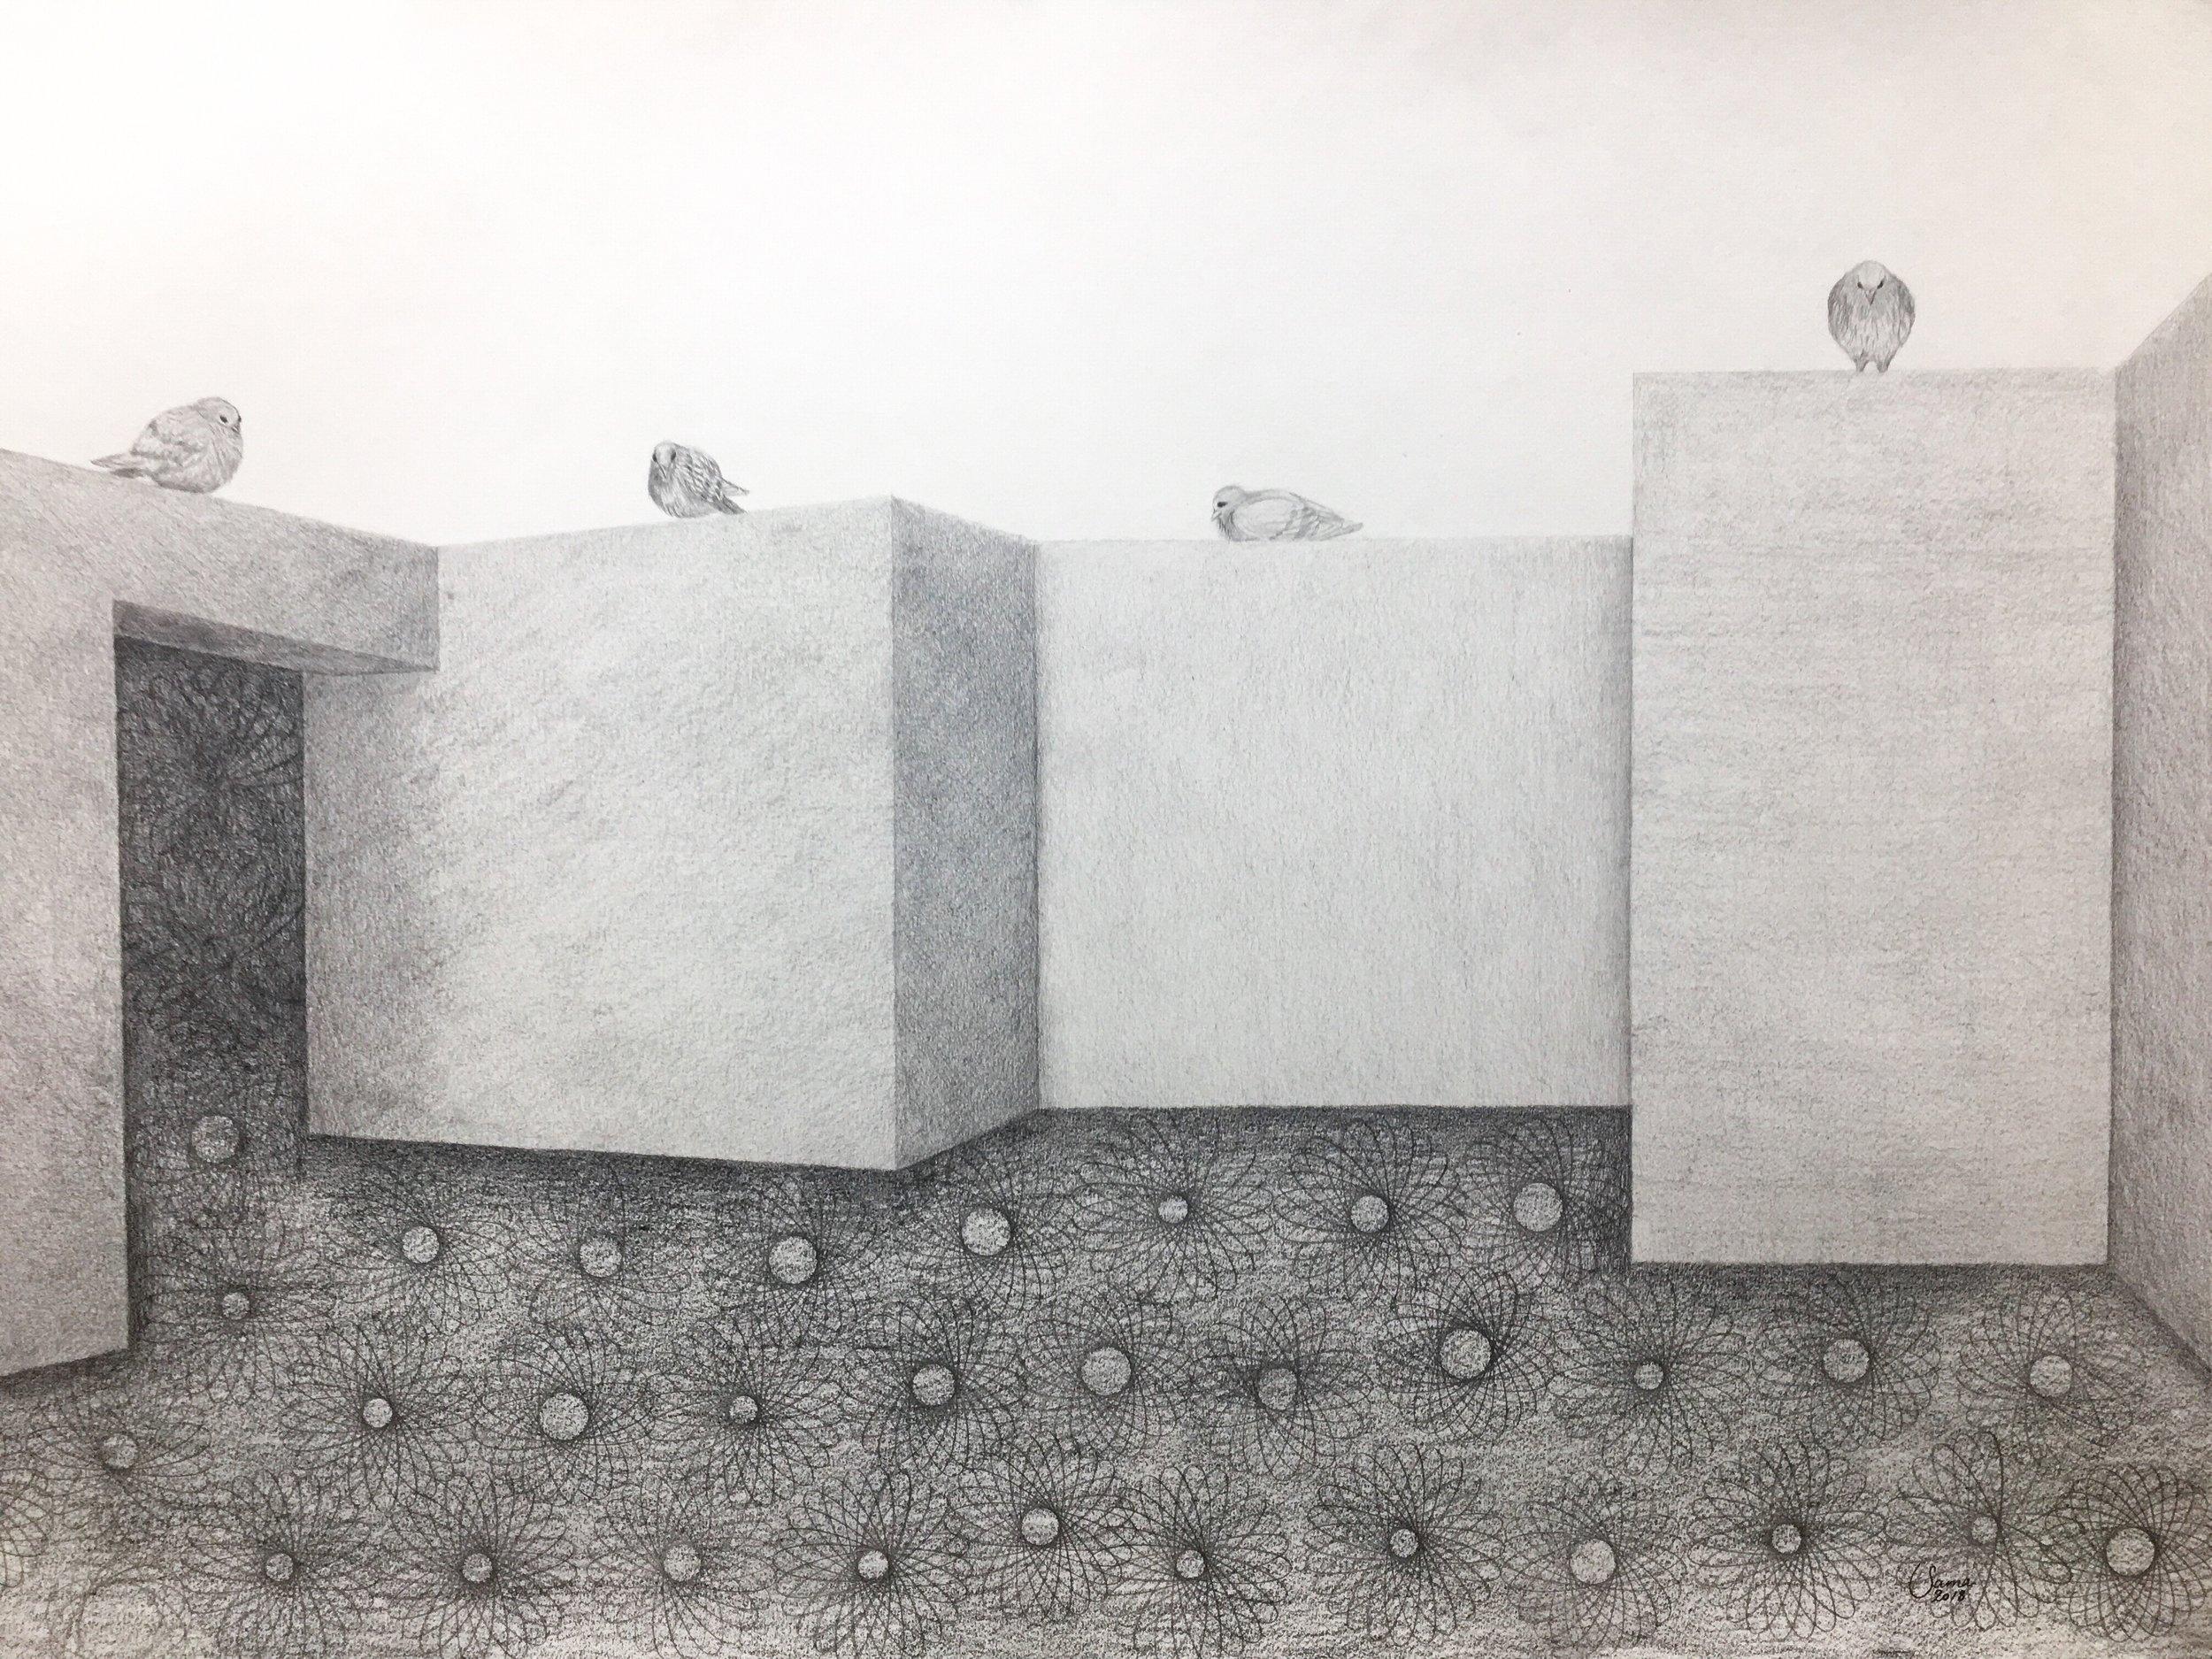 Bird's Eye View, pencil on paper, 42 x 59 cm, 2018